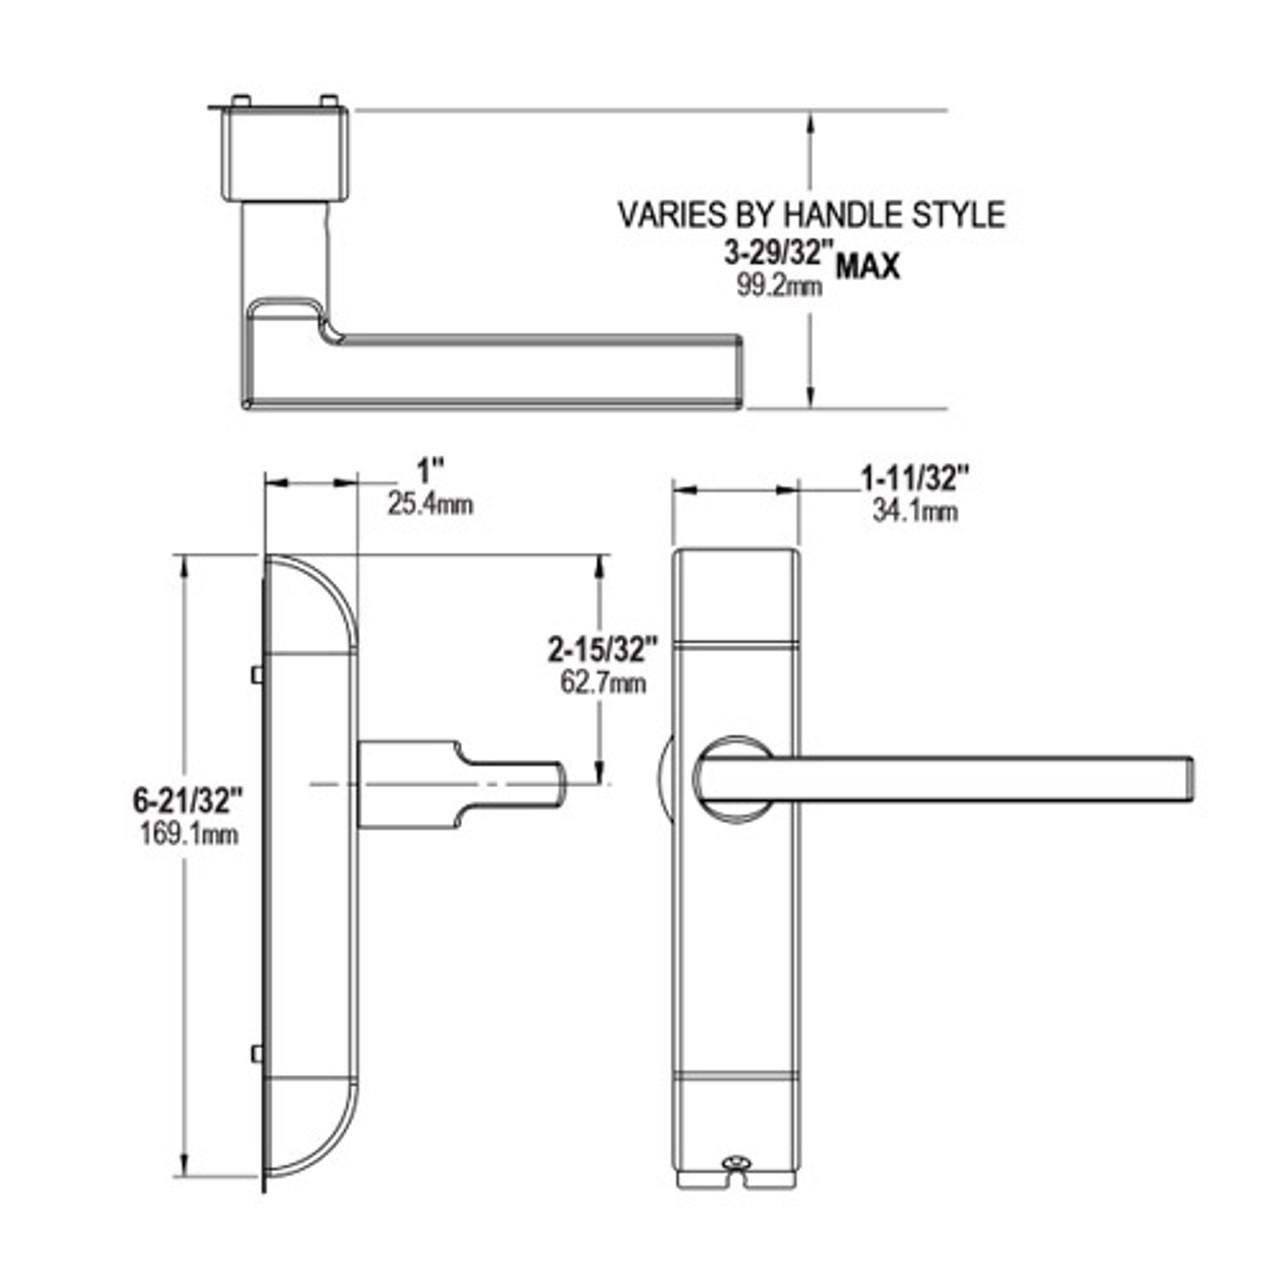 4600-MV-632-US3 Adams Rite MV Designer handle Dimensional View